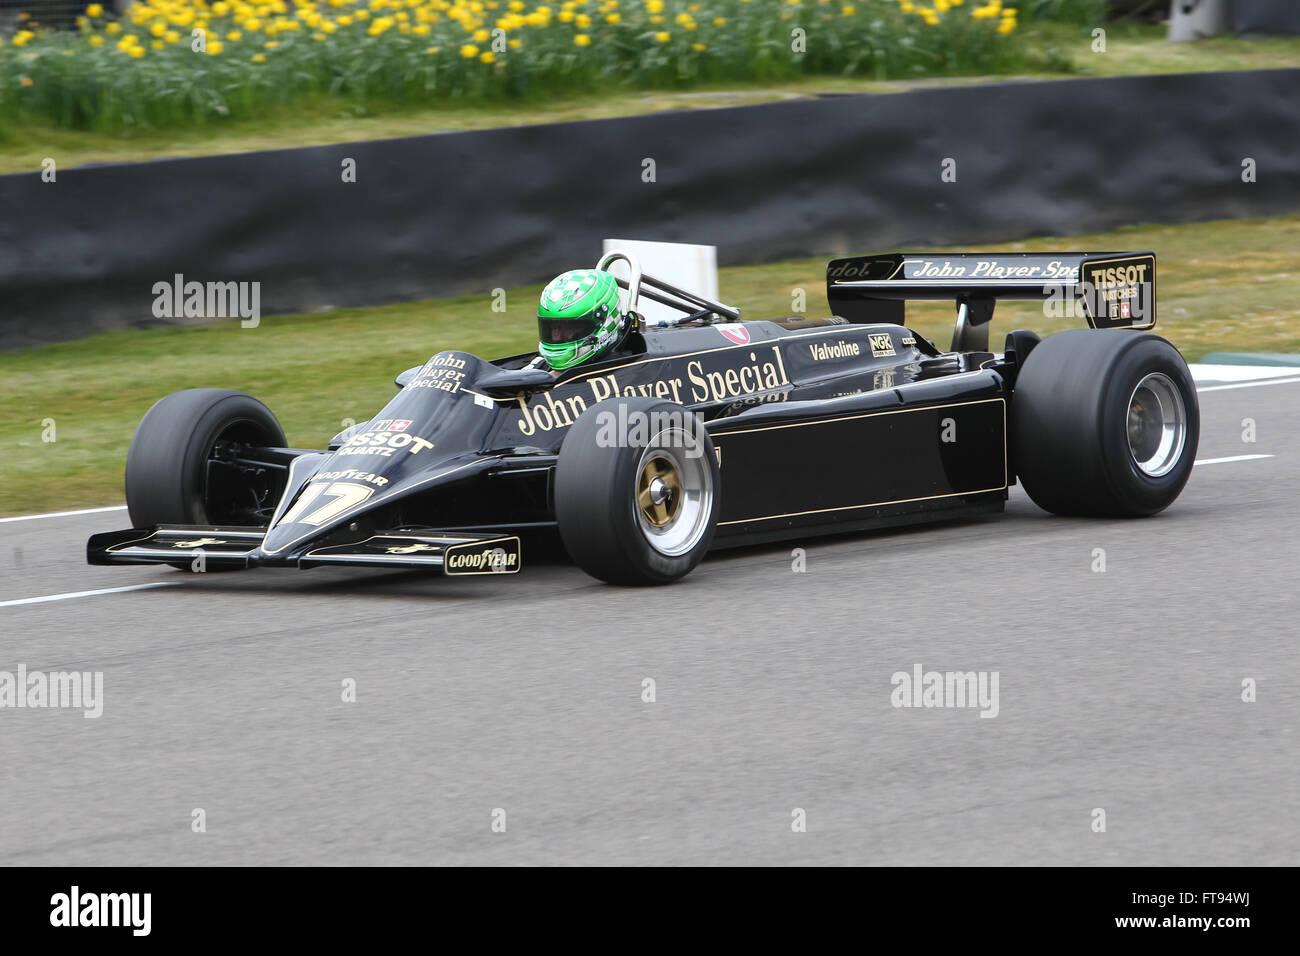 Goodwood classic historic motor racing at the Goodwood Members Meeting - Stock Image